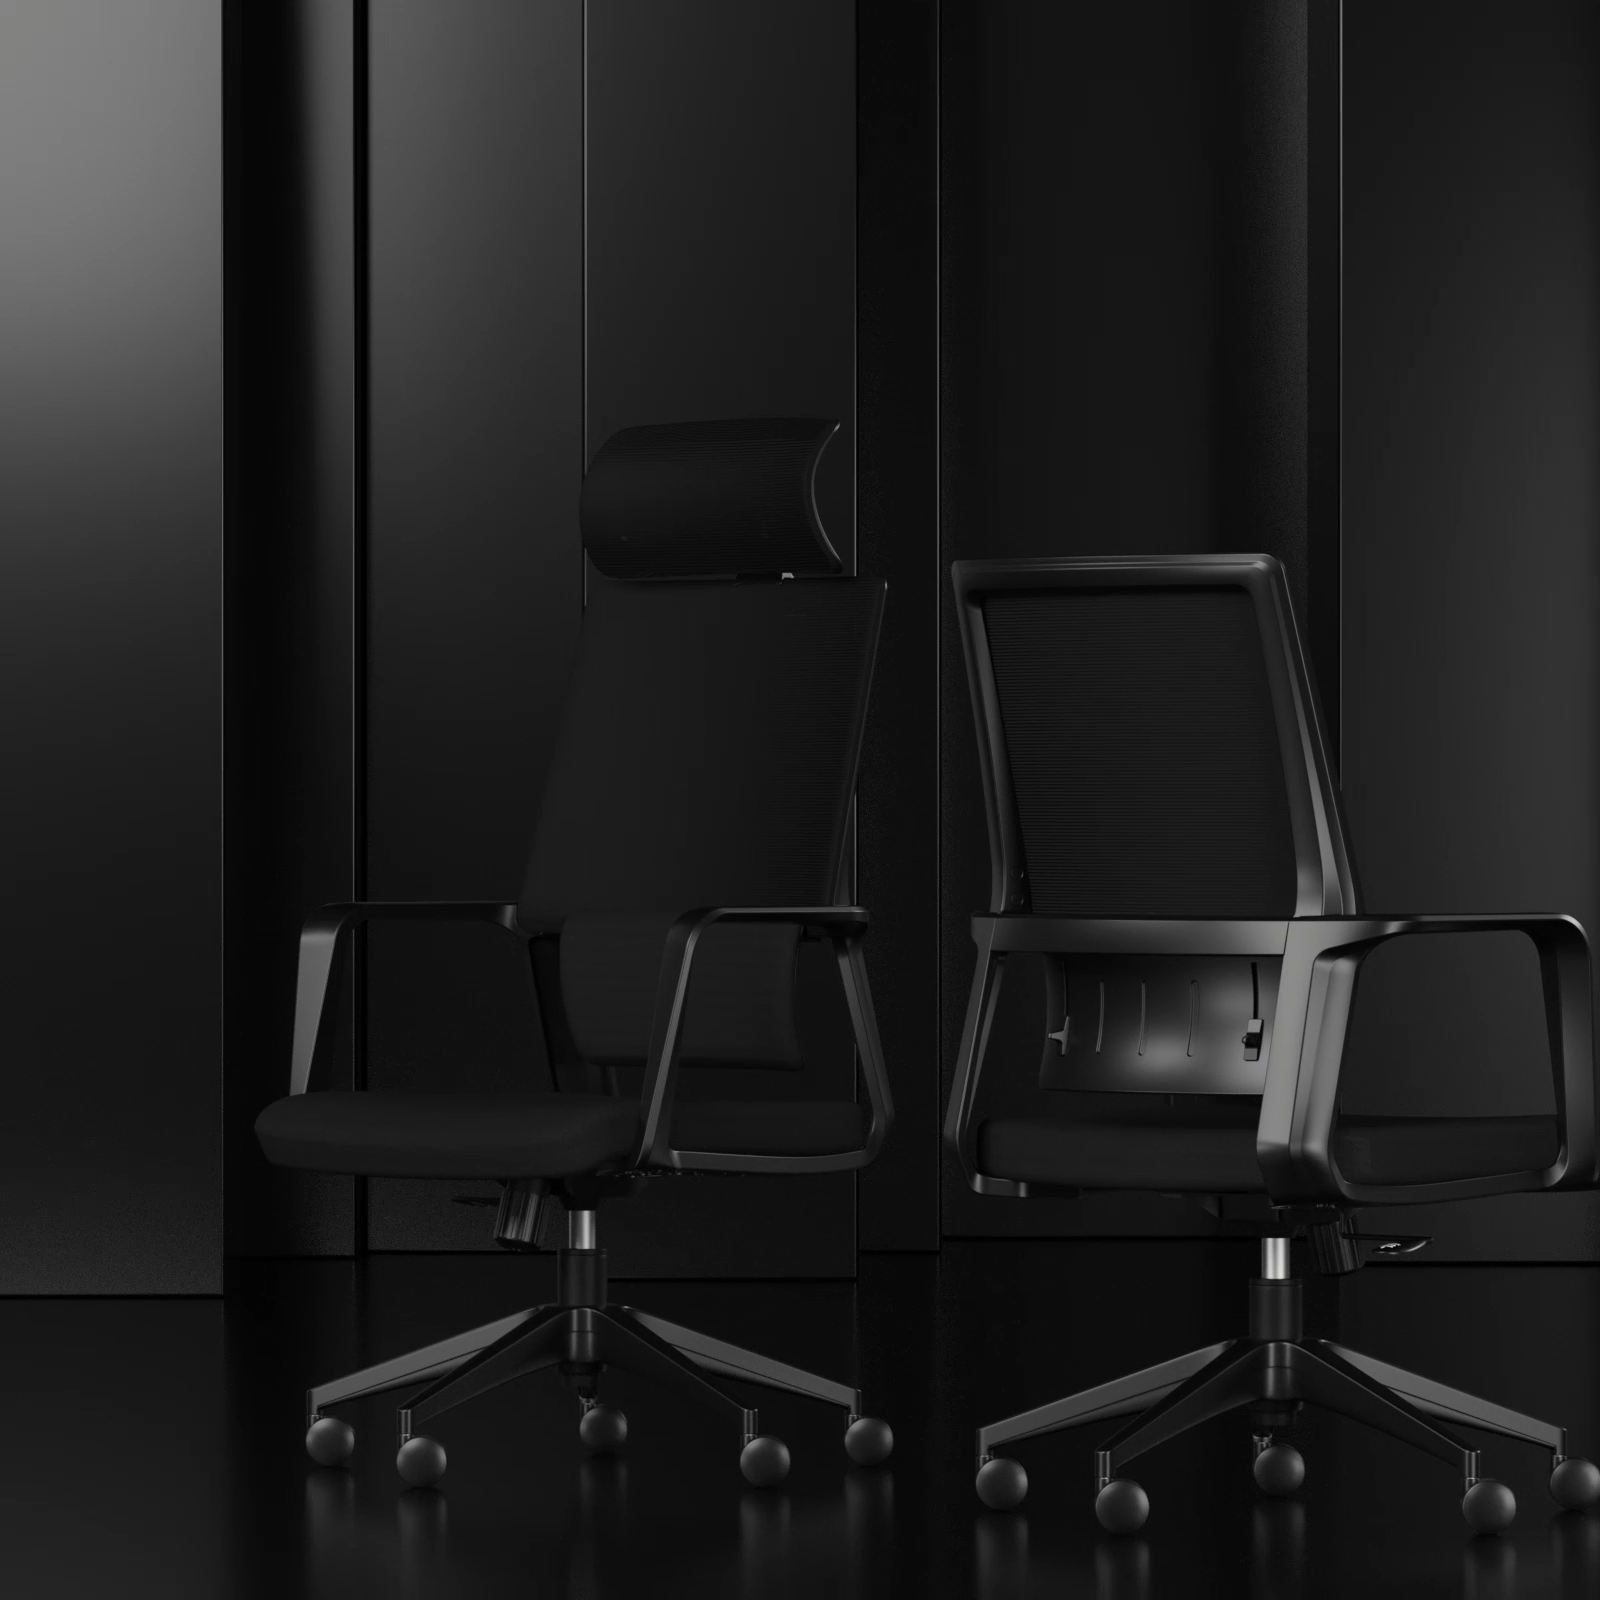 Johoofurniture Perabotan Komersial Harga Kursi Kantor Ergonomis Kursi Kantor dengan Roda